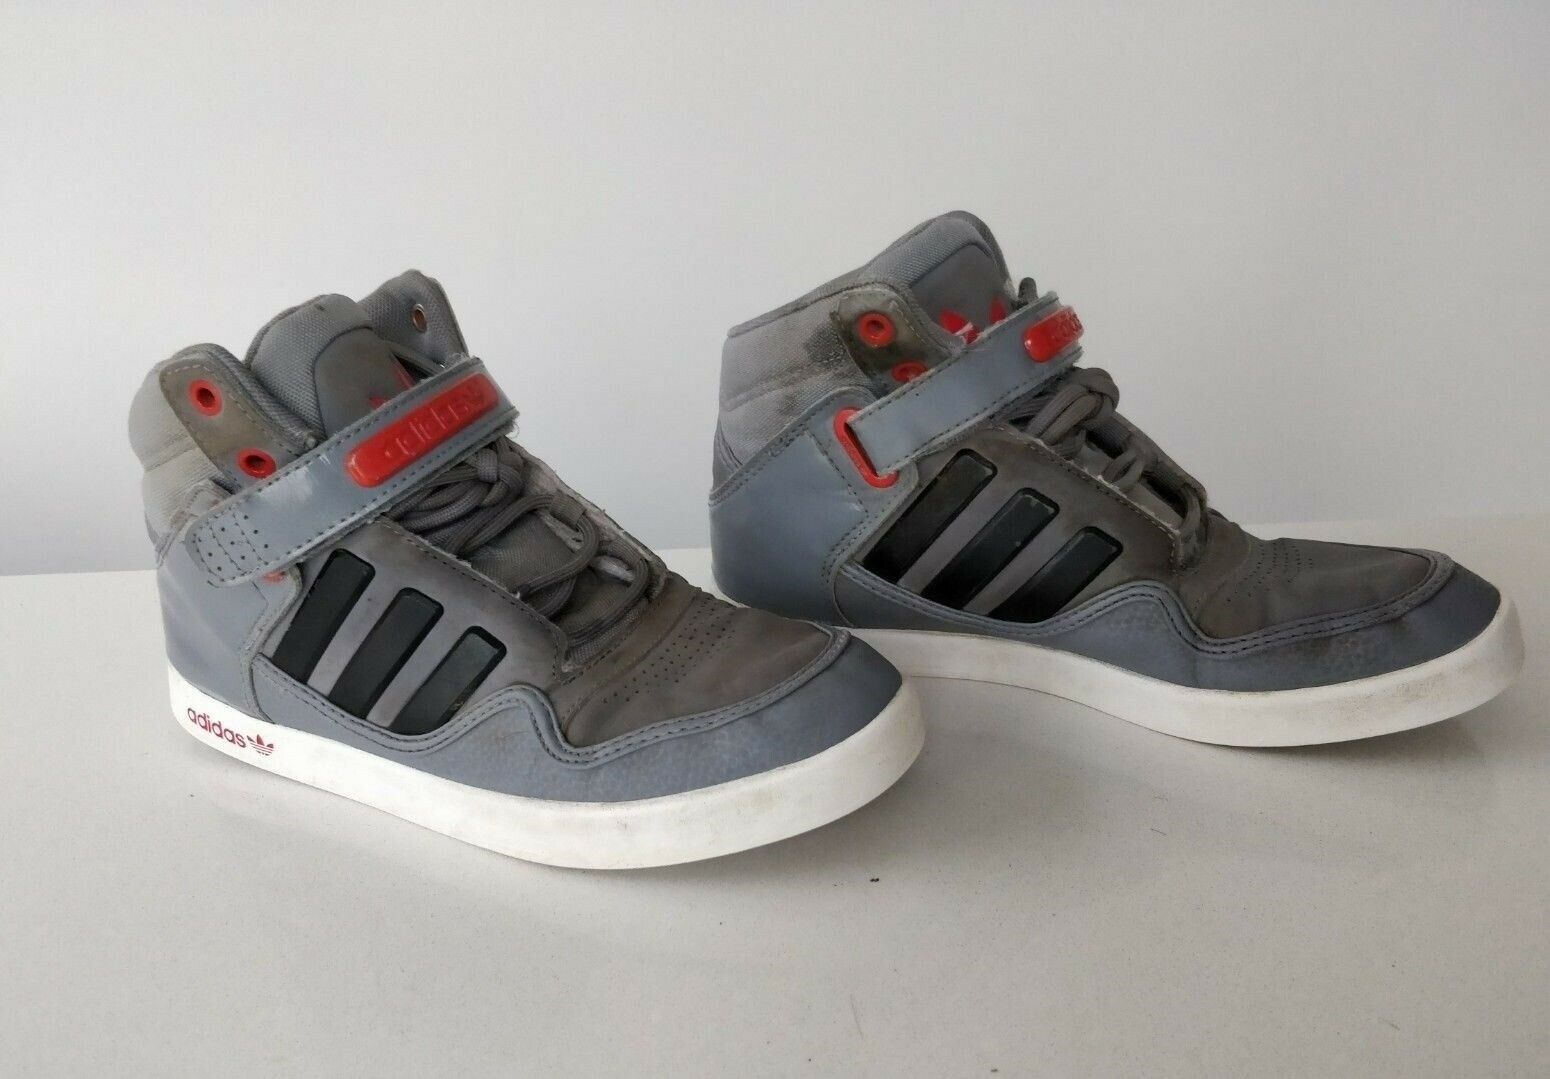 Mens Adidas grey black stripe lace grey hi high top trainers shoe UK 5.5 EU 38.6